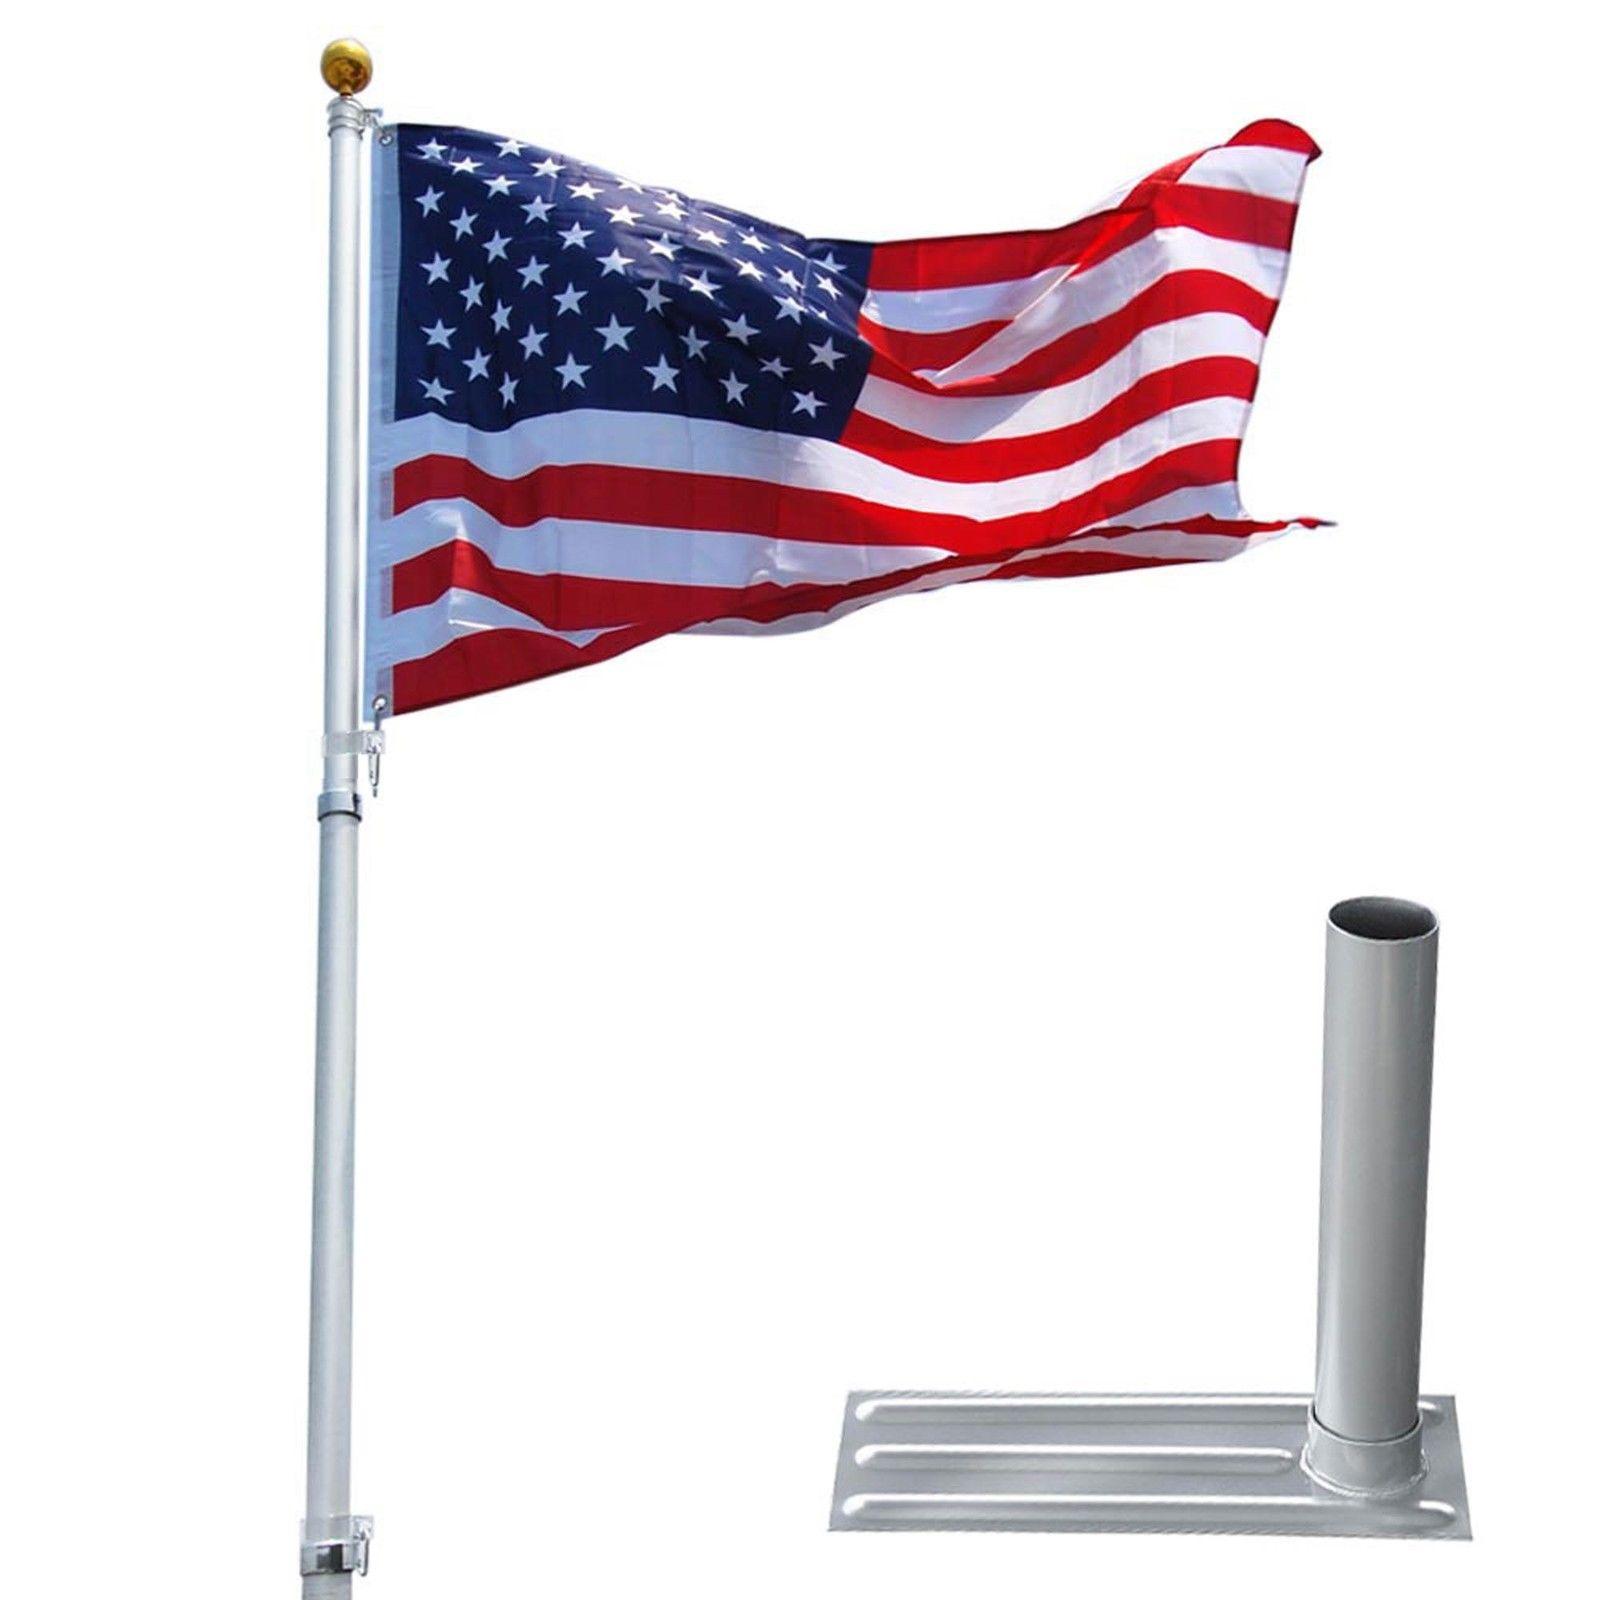 GHP 20' Aluminum Telescoping Flag Pole w 3'x5' American F...